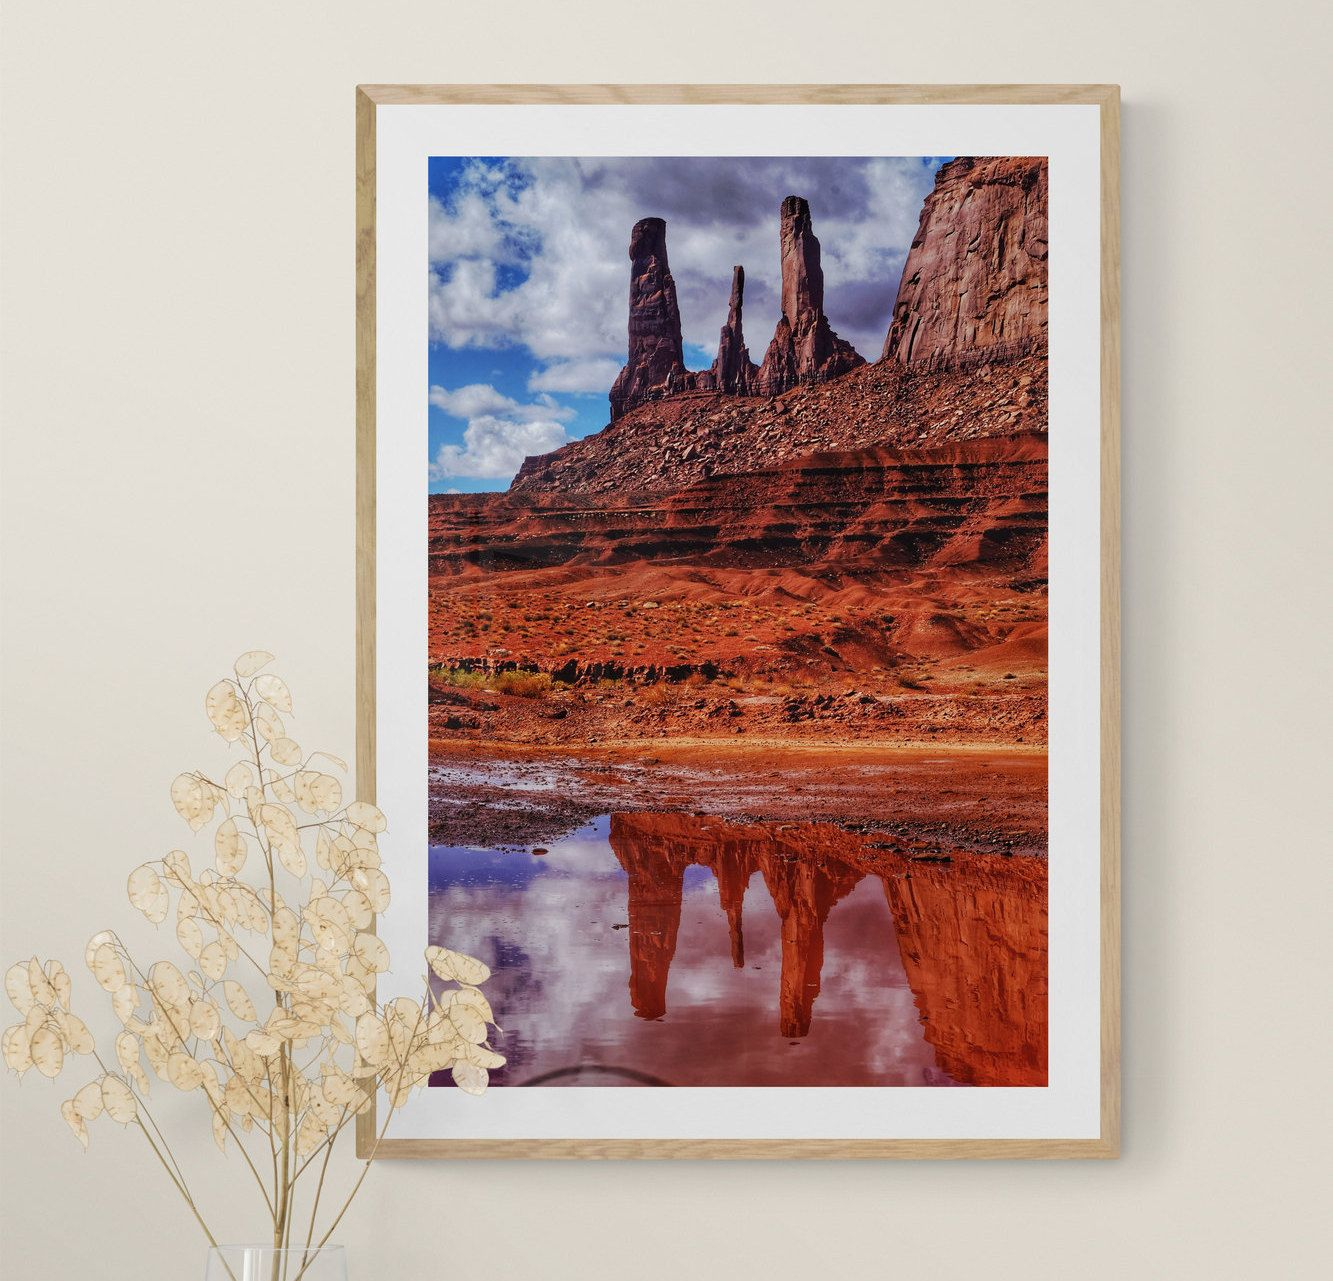 Monument Valley Photo, Reflection Photo, Arizona Wall Art, Arizona Home Decor, Southwestern Decor usa #LargeWallArt #DesertPhotography #ArizonaWallArt #SouthwesternDecor #NavajoPhoto #ArizonaPhotography #ReflectionPhoto #MountainWallArt #UtahPhotography #MonumentValley